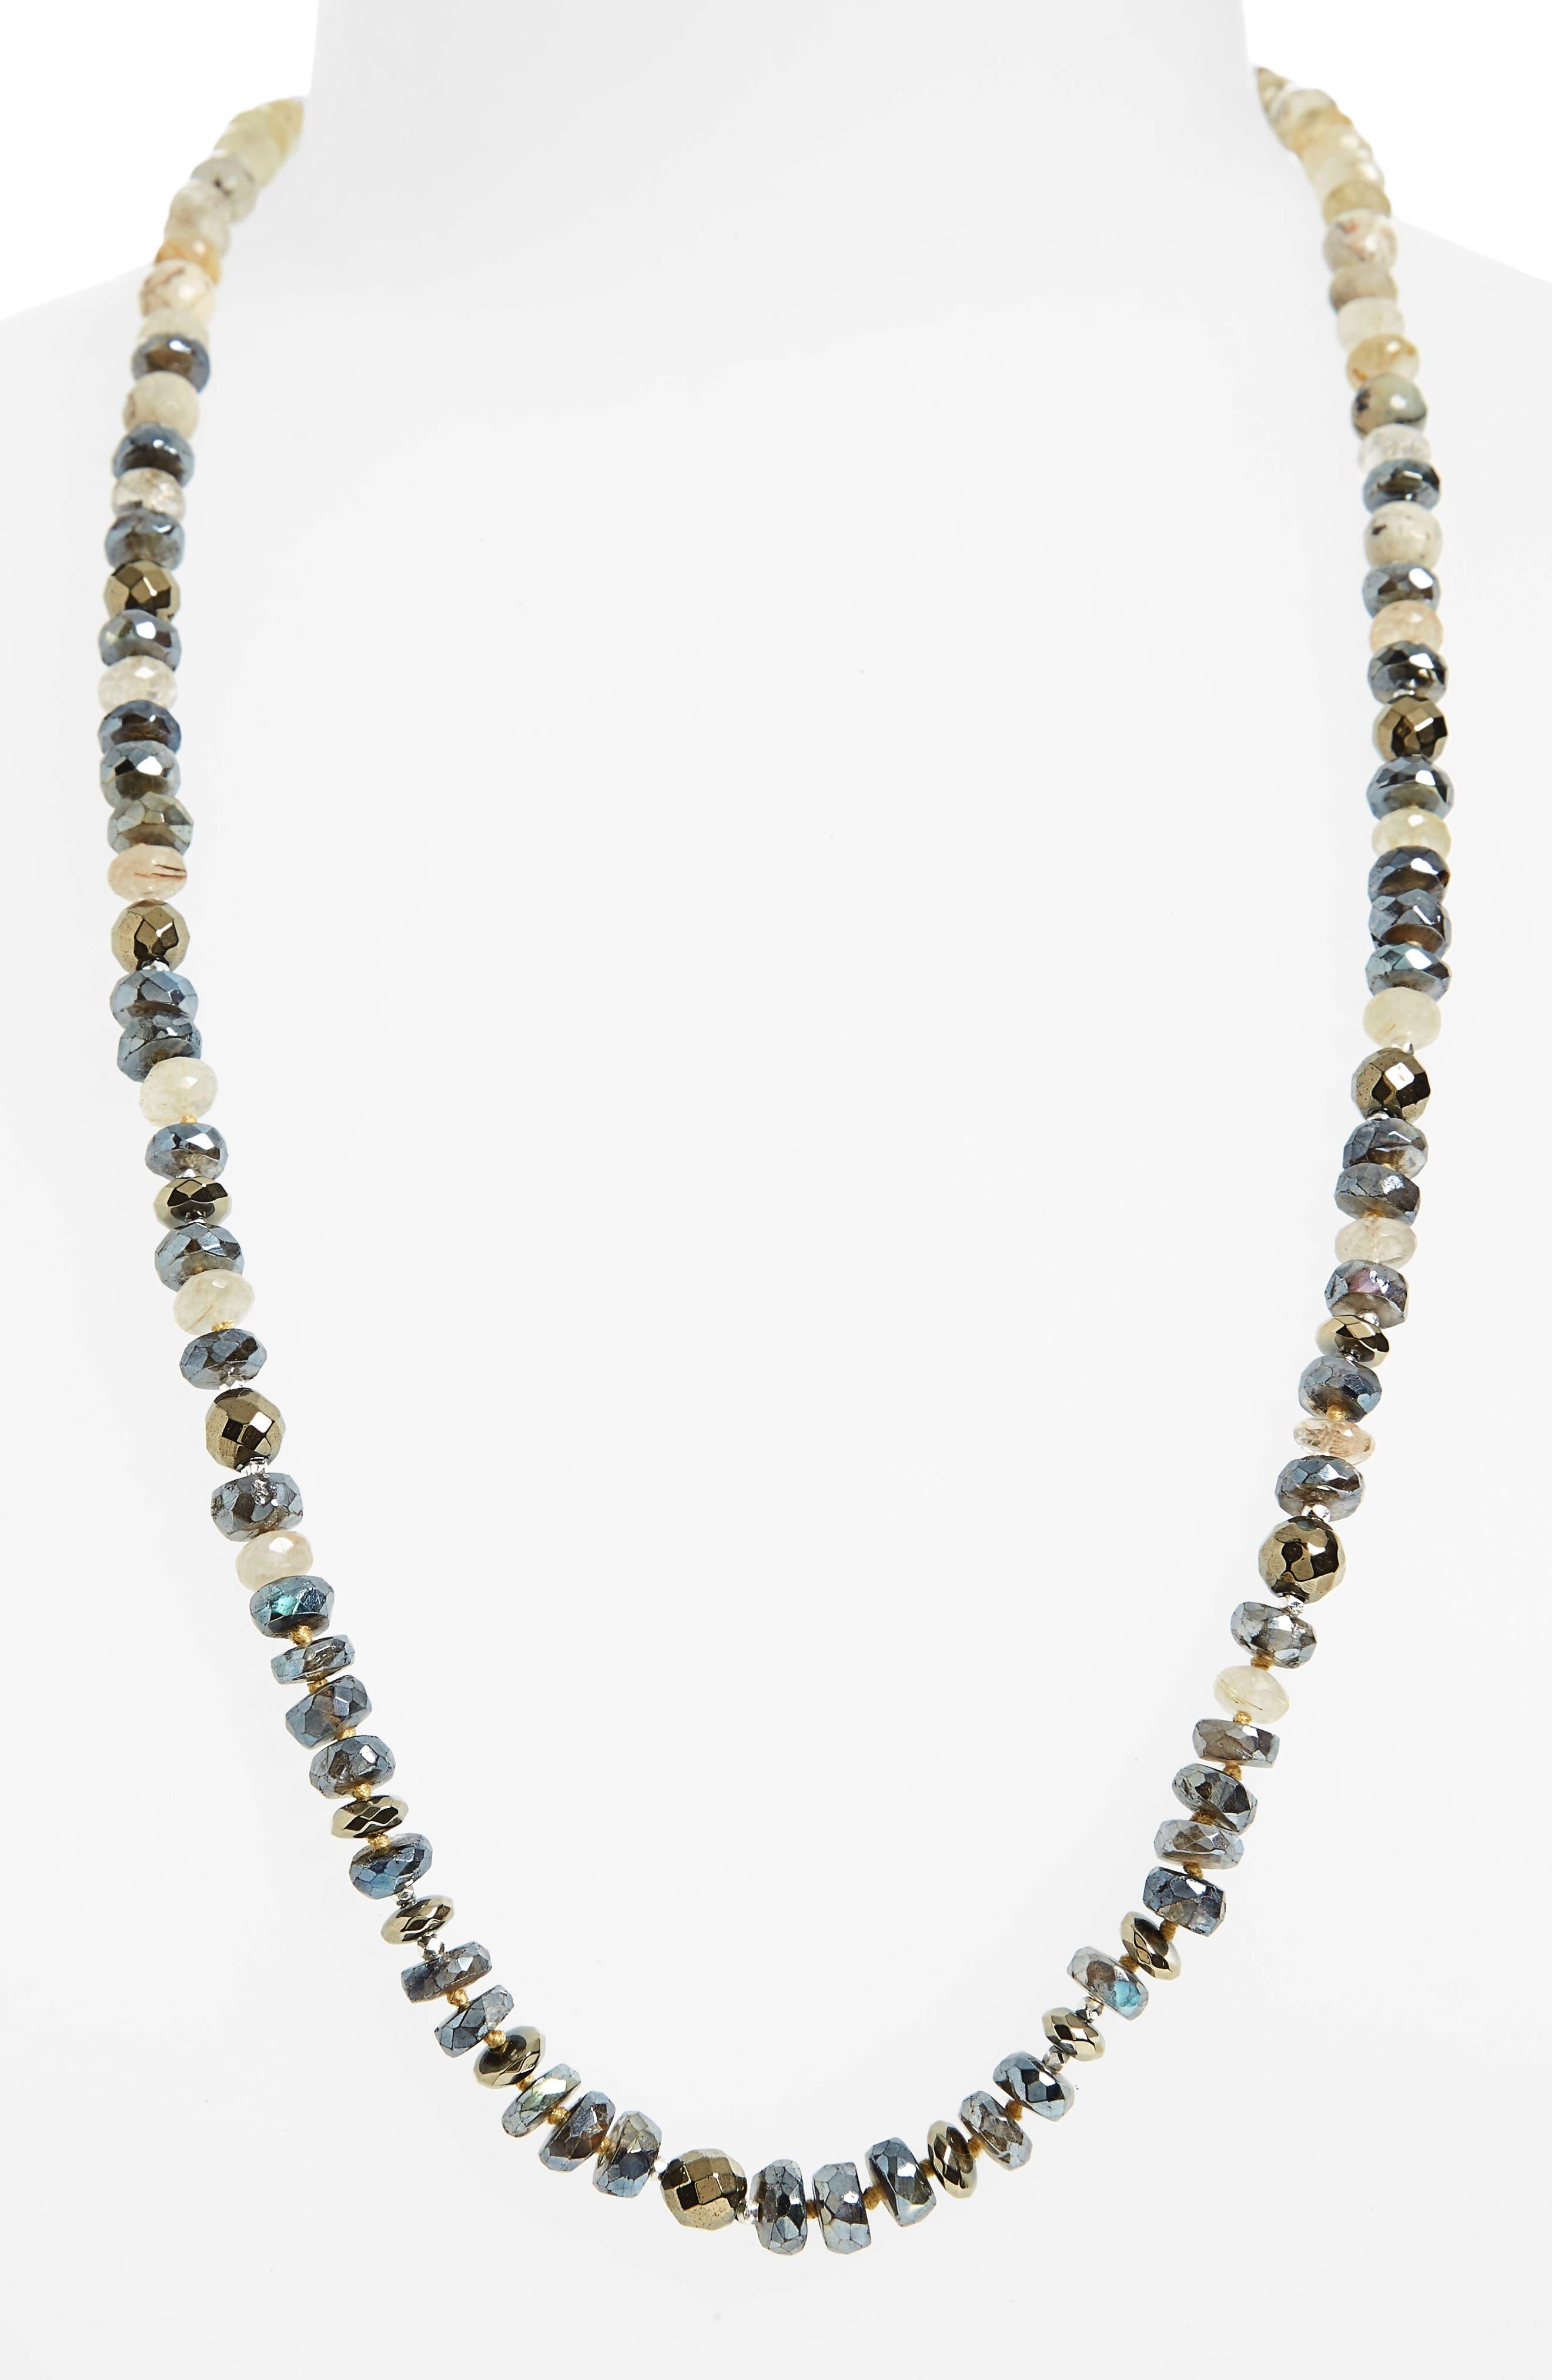 Semiprecious Stone Adjustable Necklace,                             Alternate thumbnail 2, color,                             040